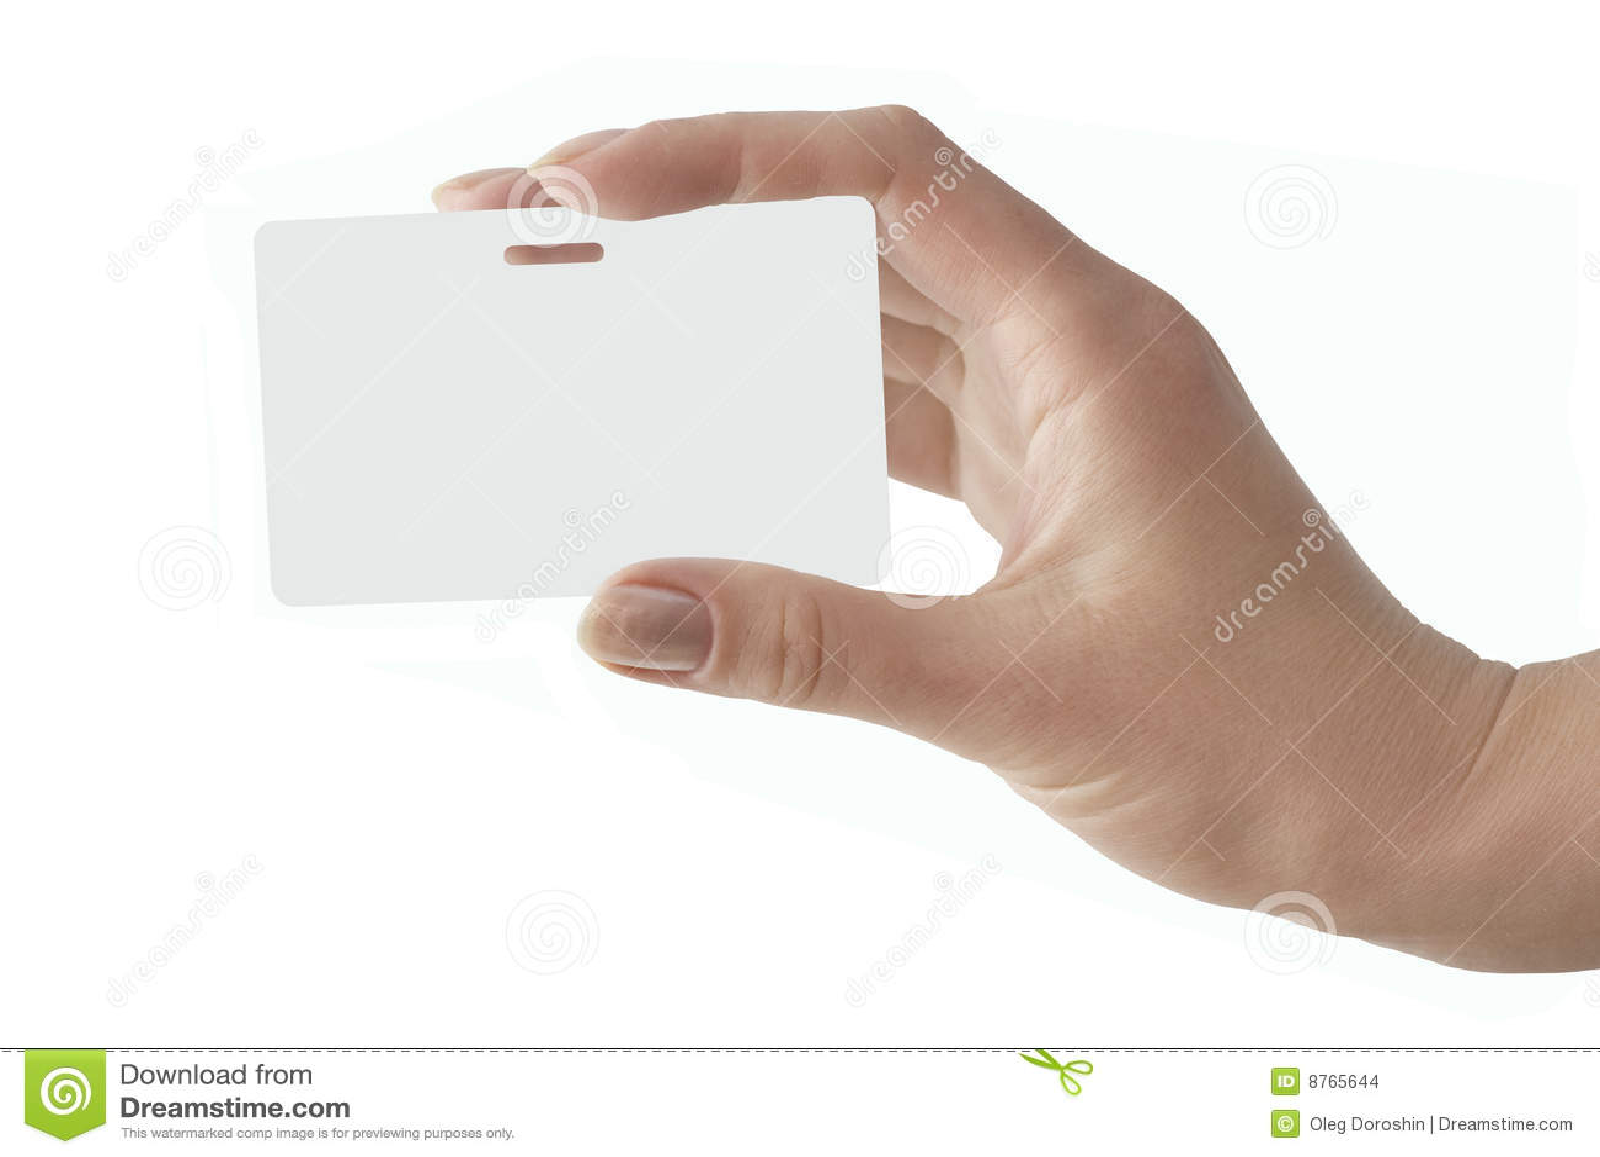 La mano tiene un distintivo bianco